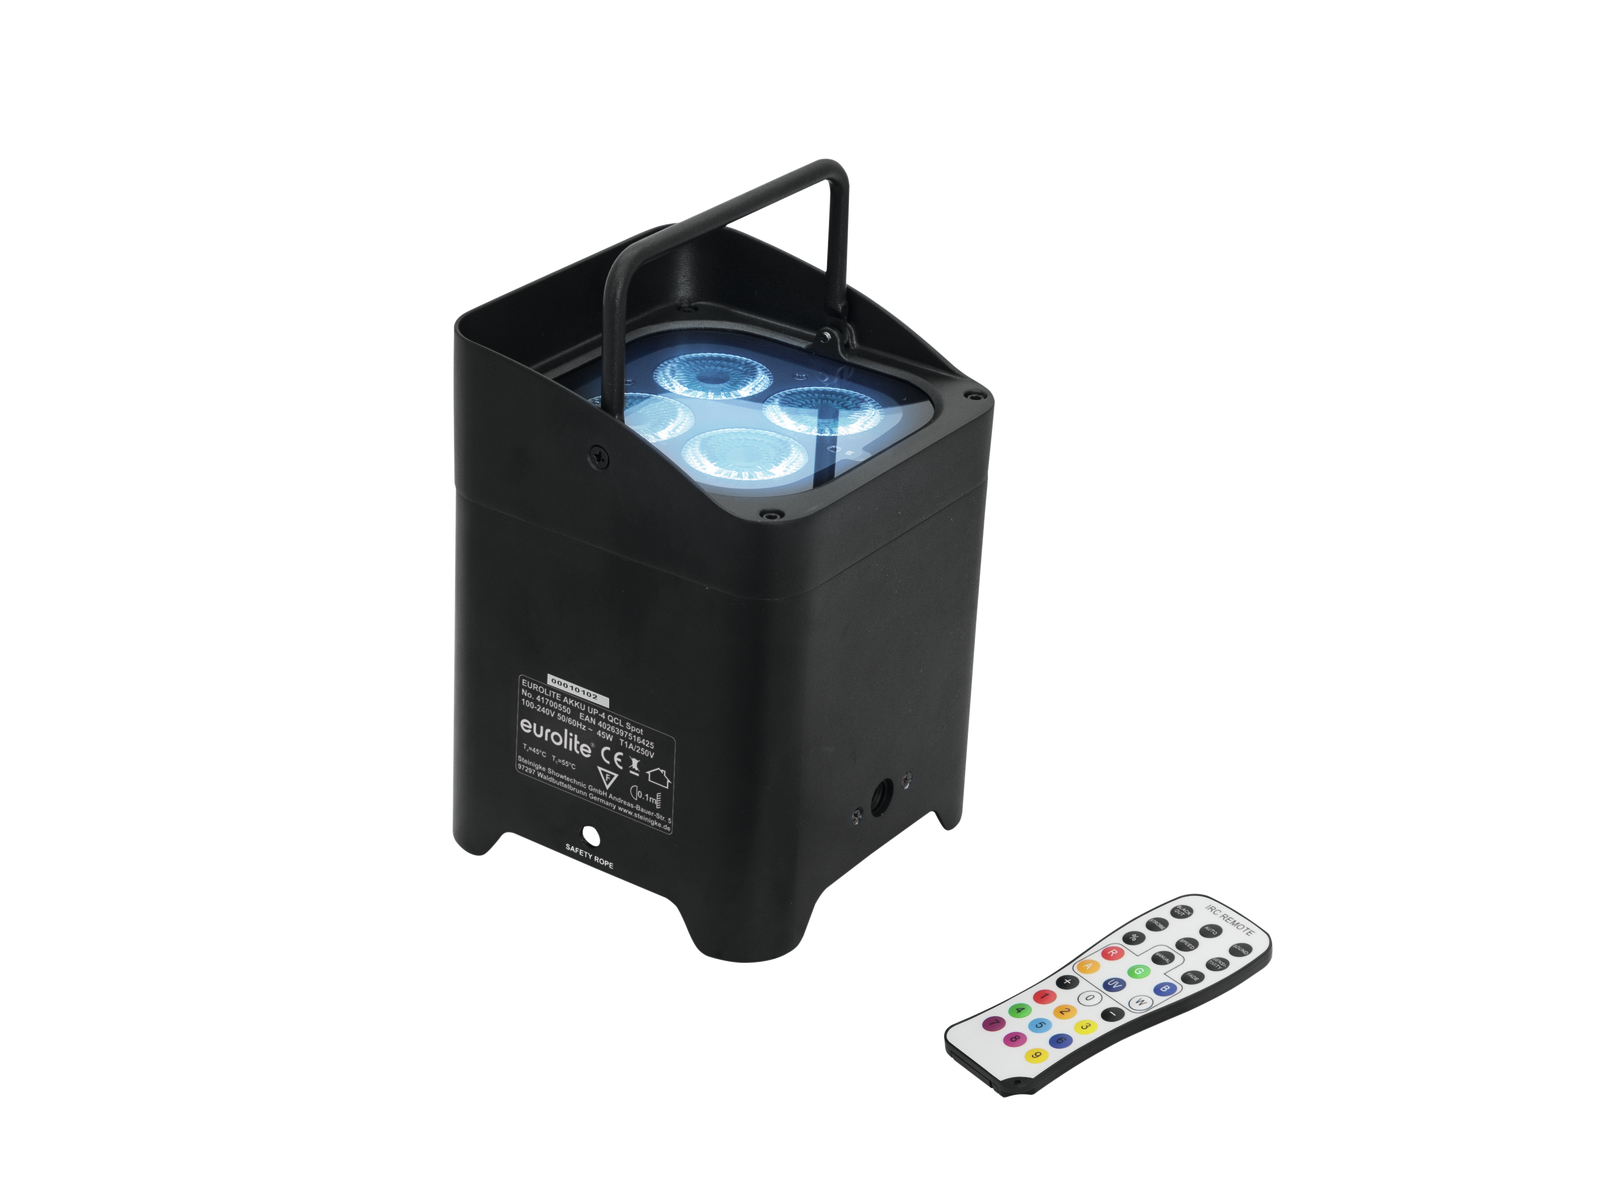 Eurolite LED AKKU TRUSSLIGHT 4x8W QCL DMX, IR, dobíjecí baterie